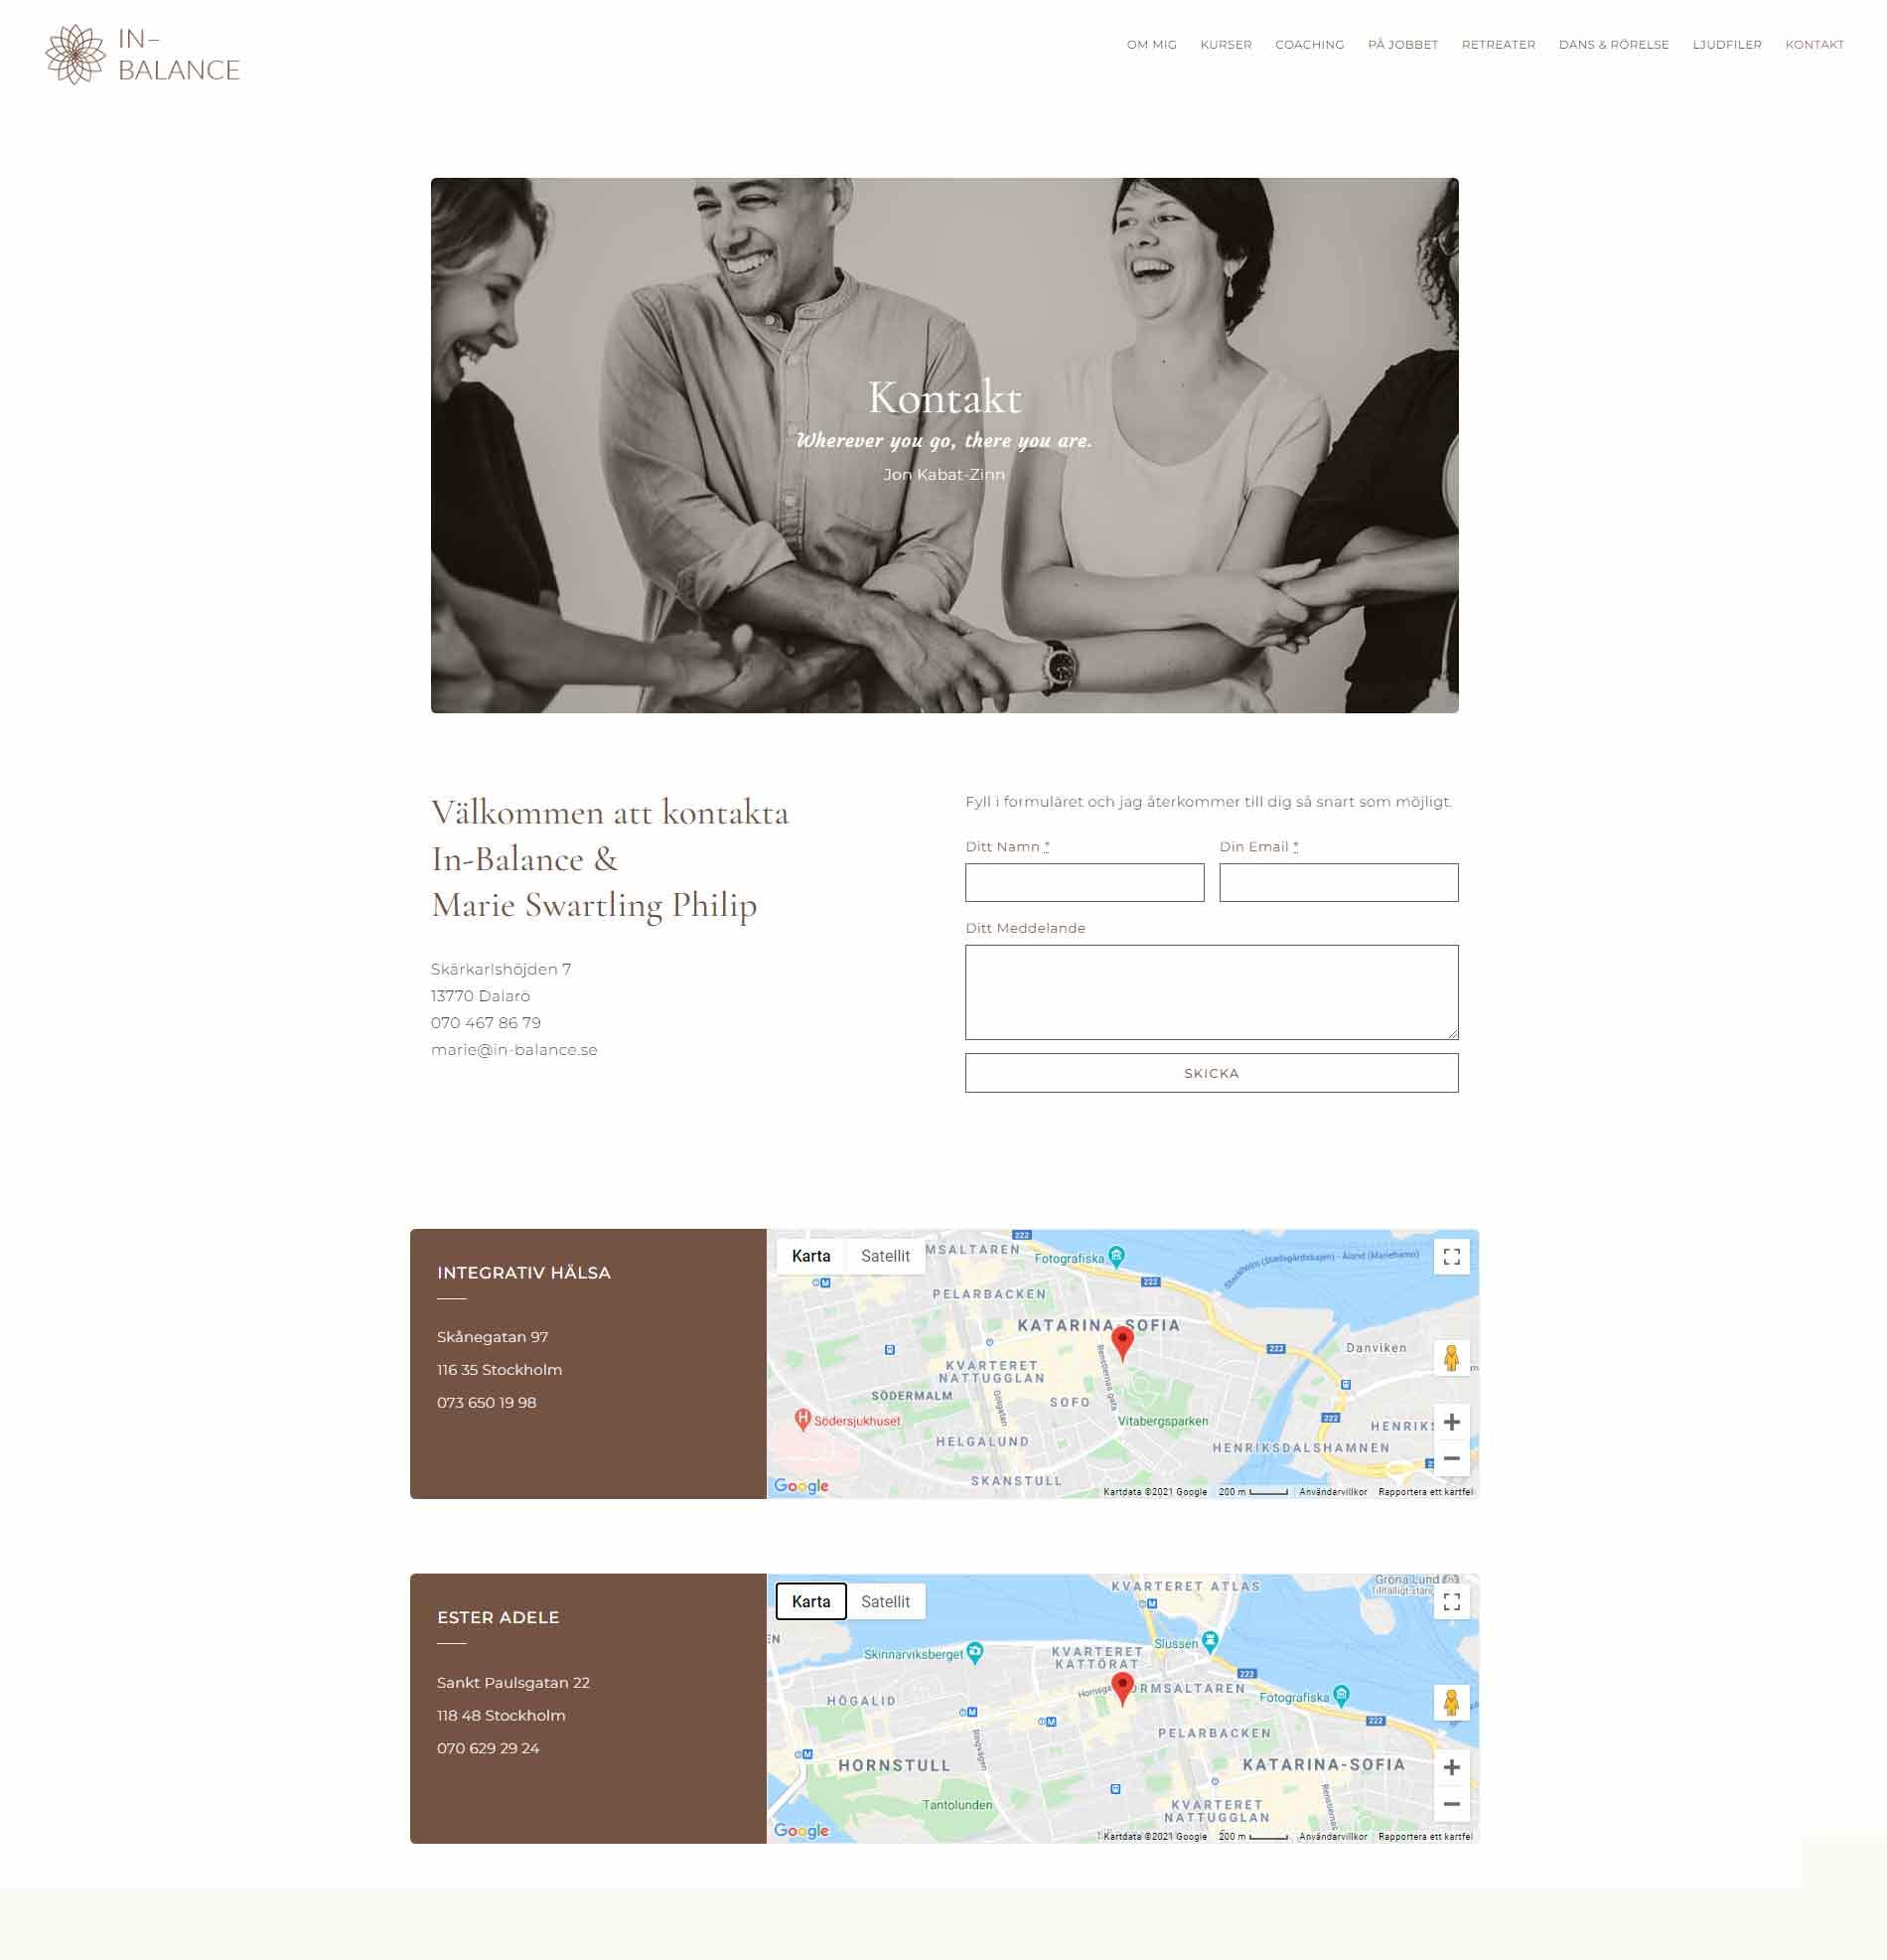 Web design anweb In-Balance Mindfulness